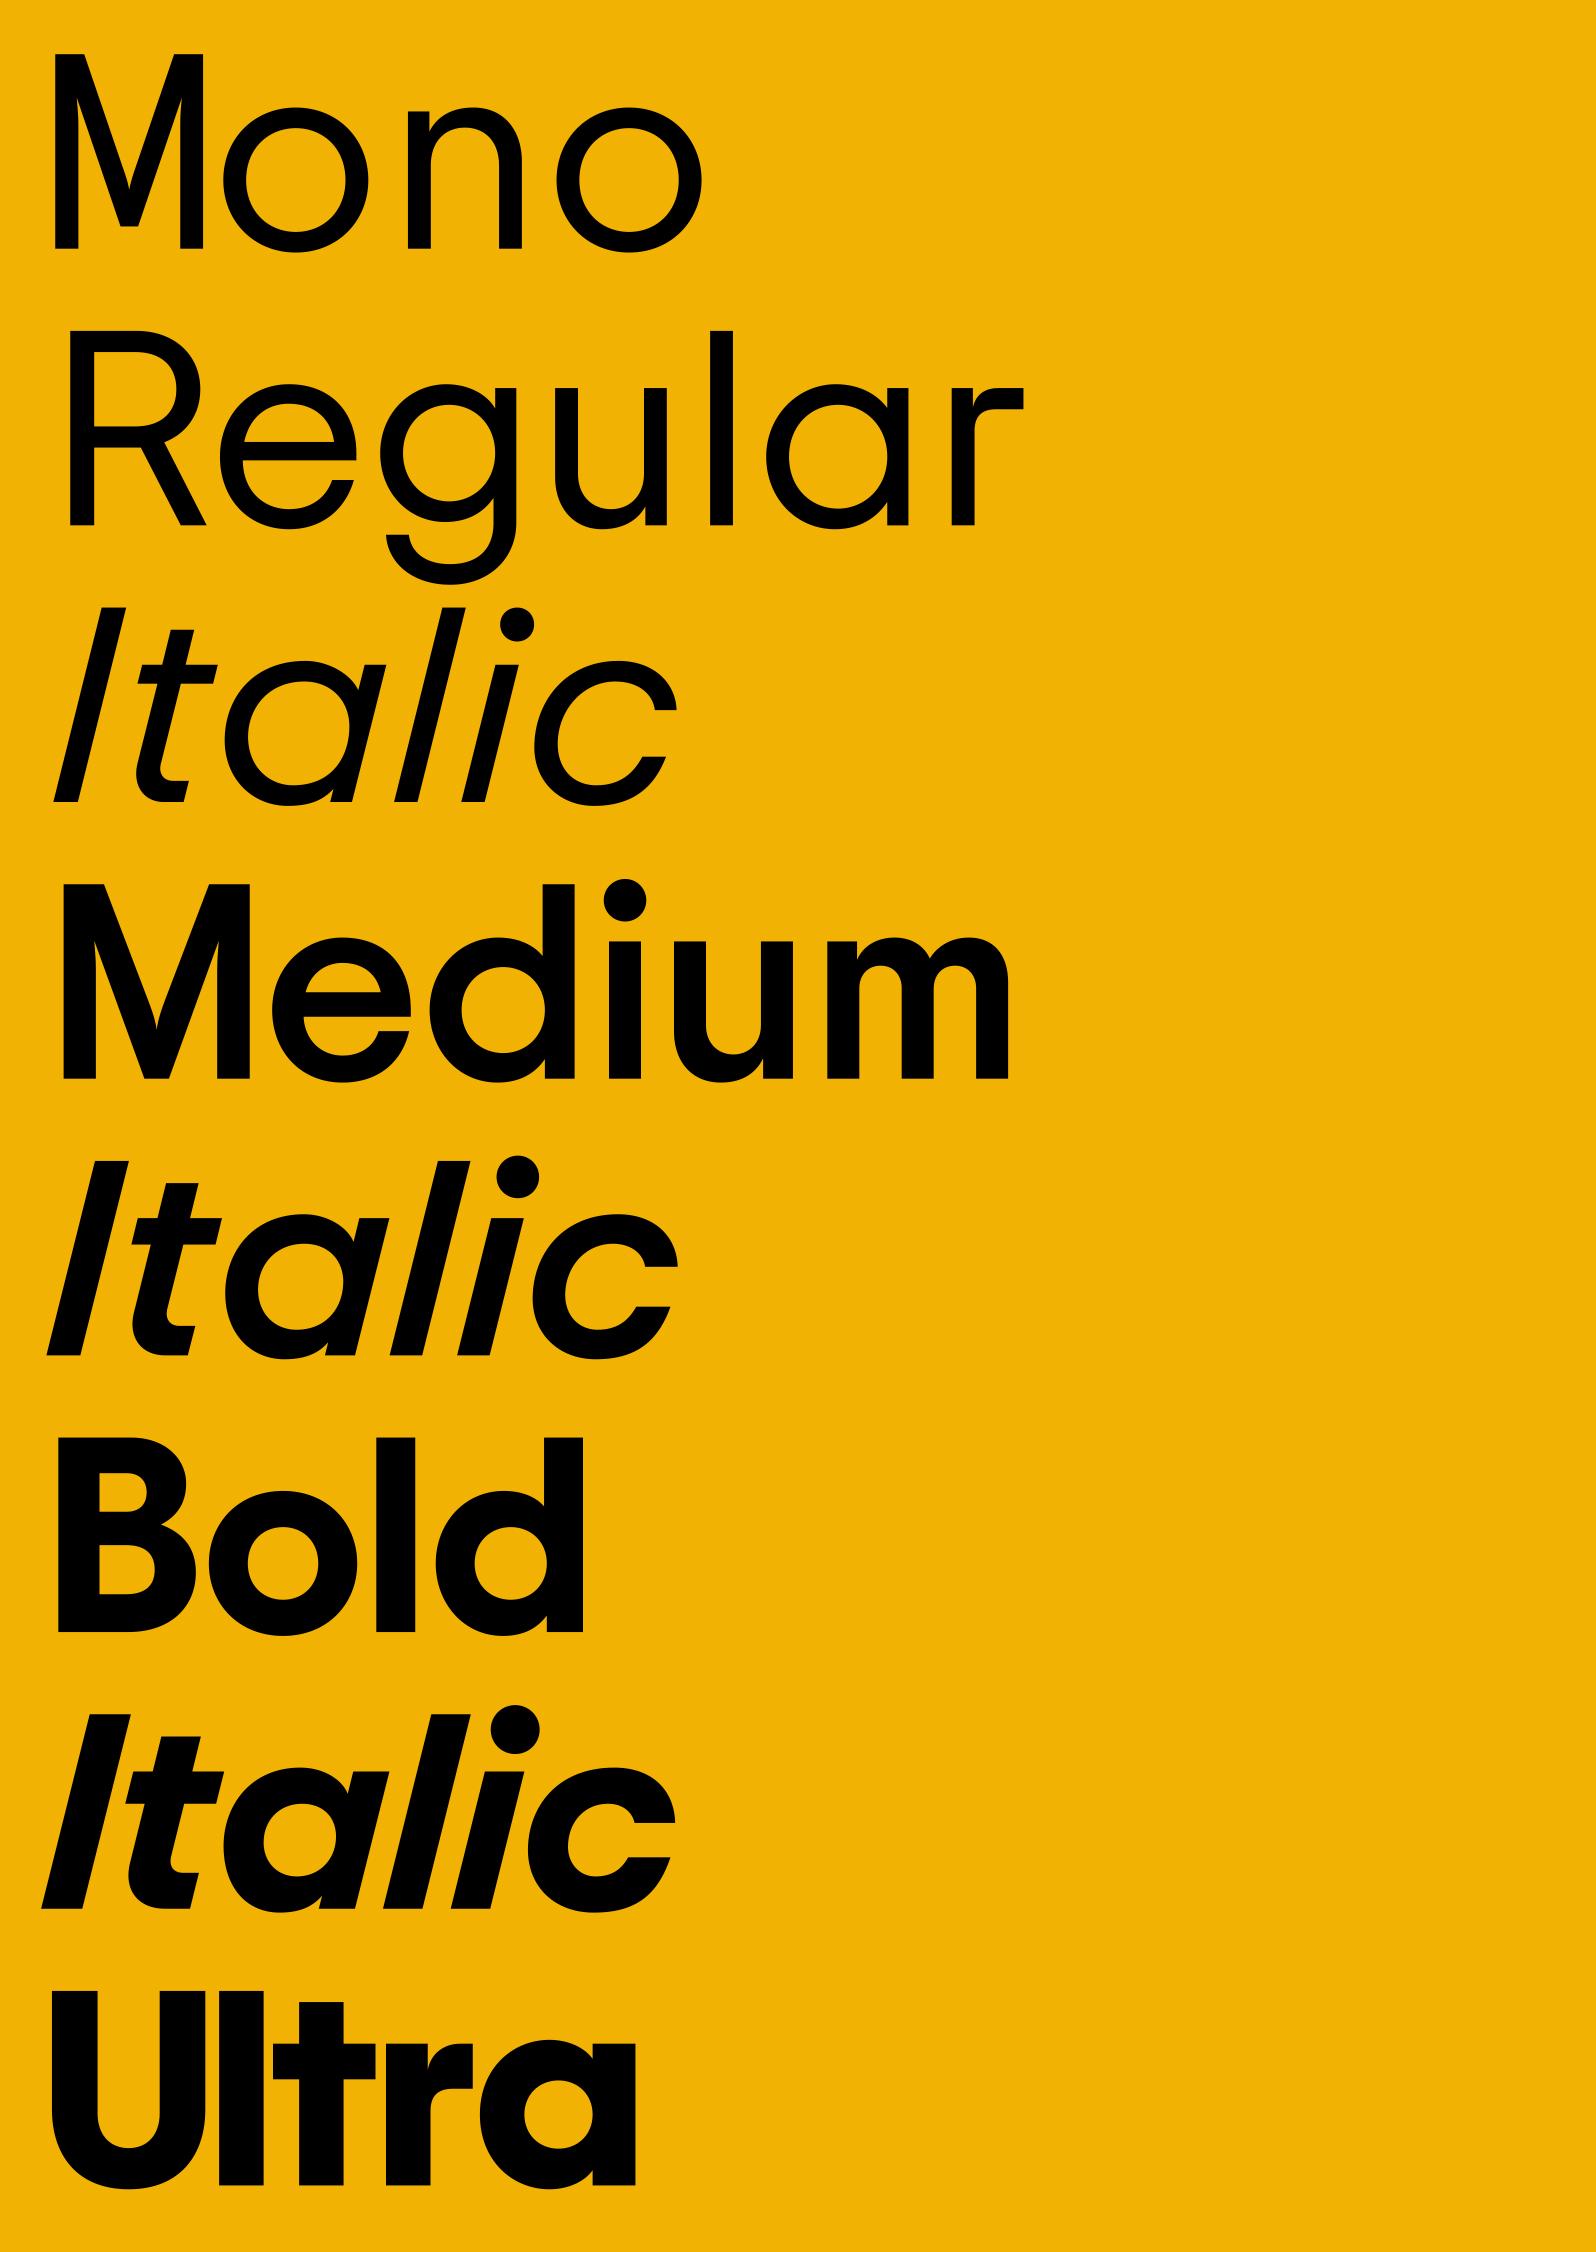 tripadvisor-nuevo-logo